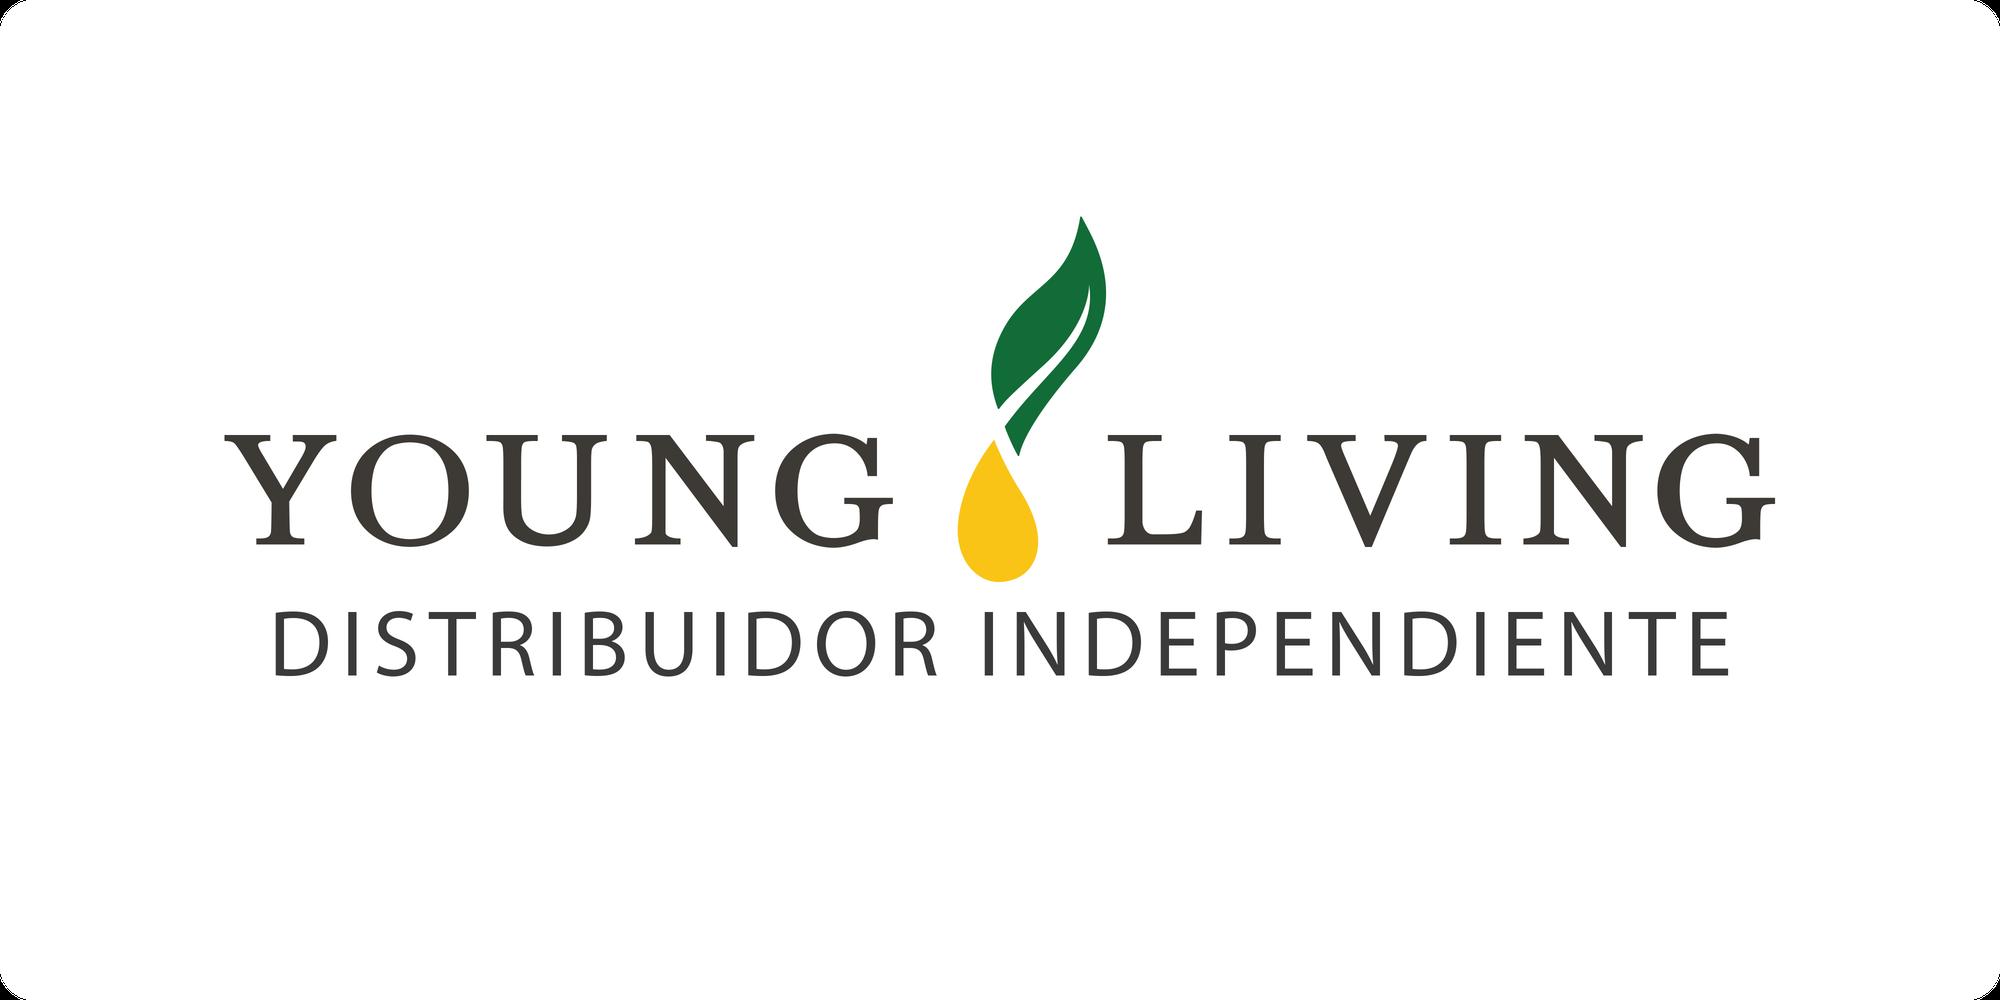 distribuidora independiente de Young Living